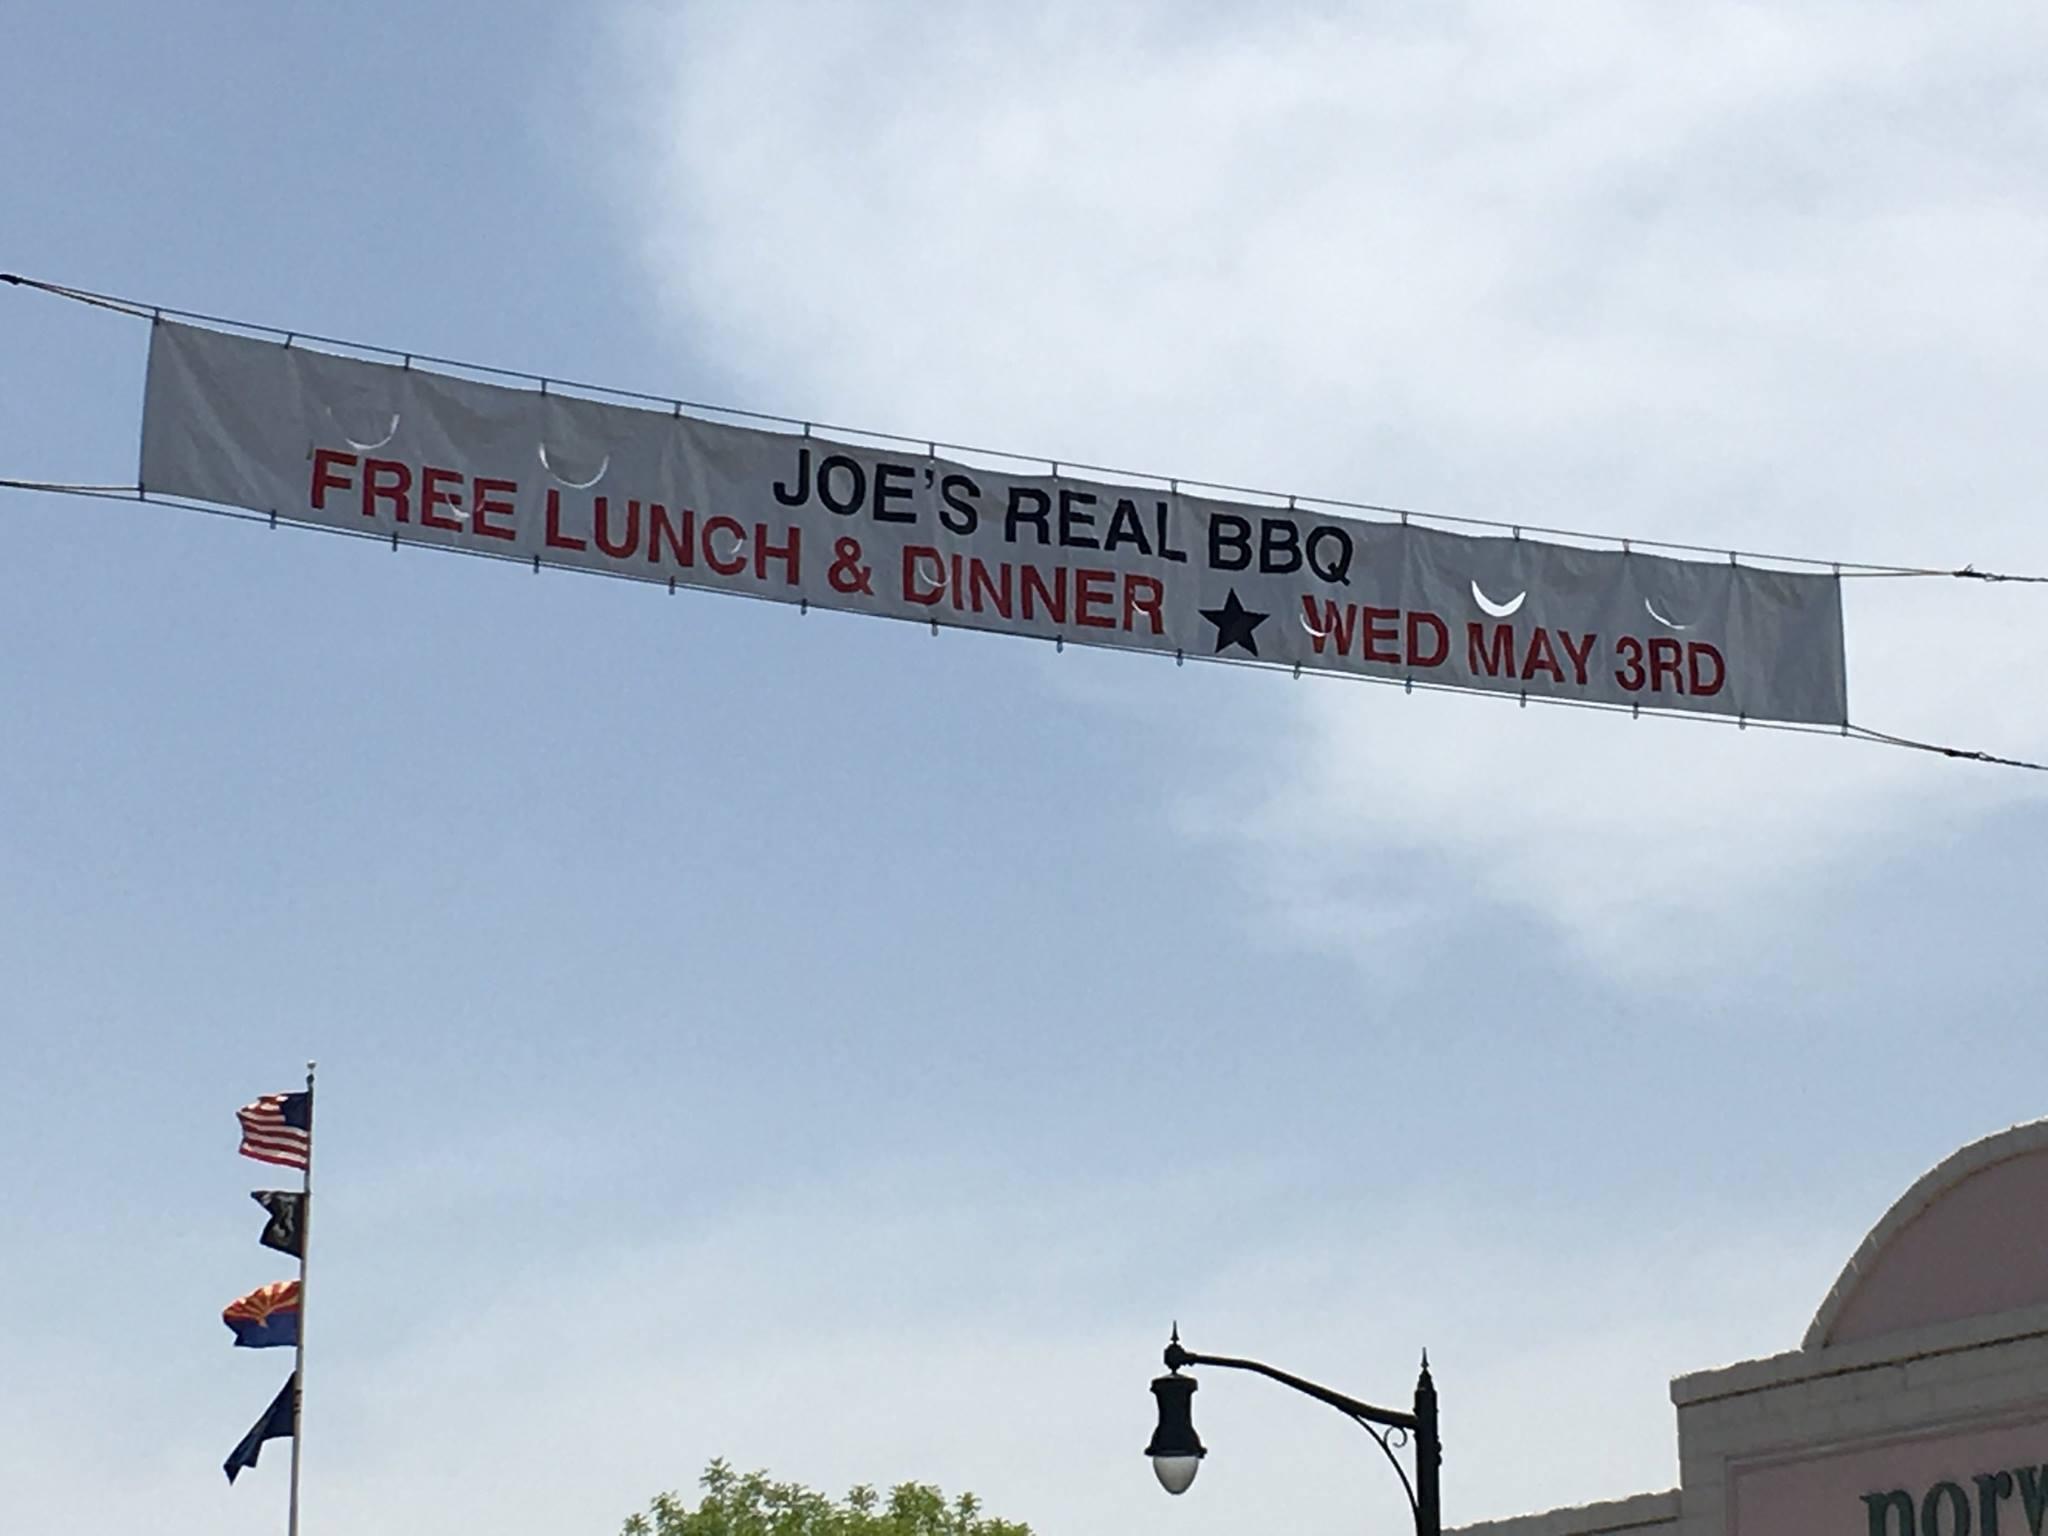 (Source: Joe's Real BBQ)